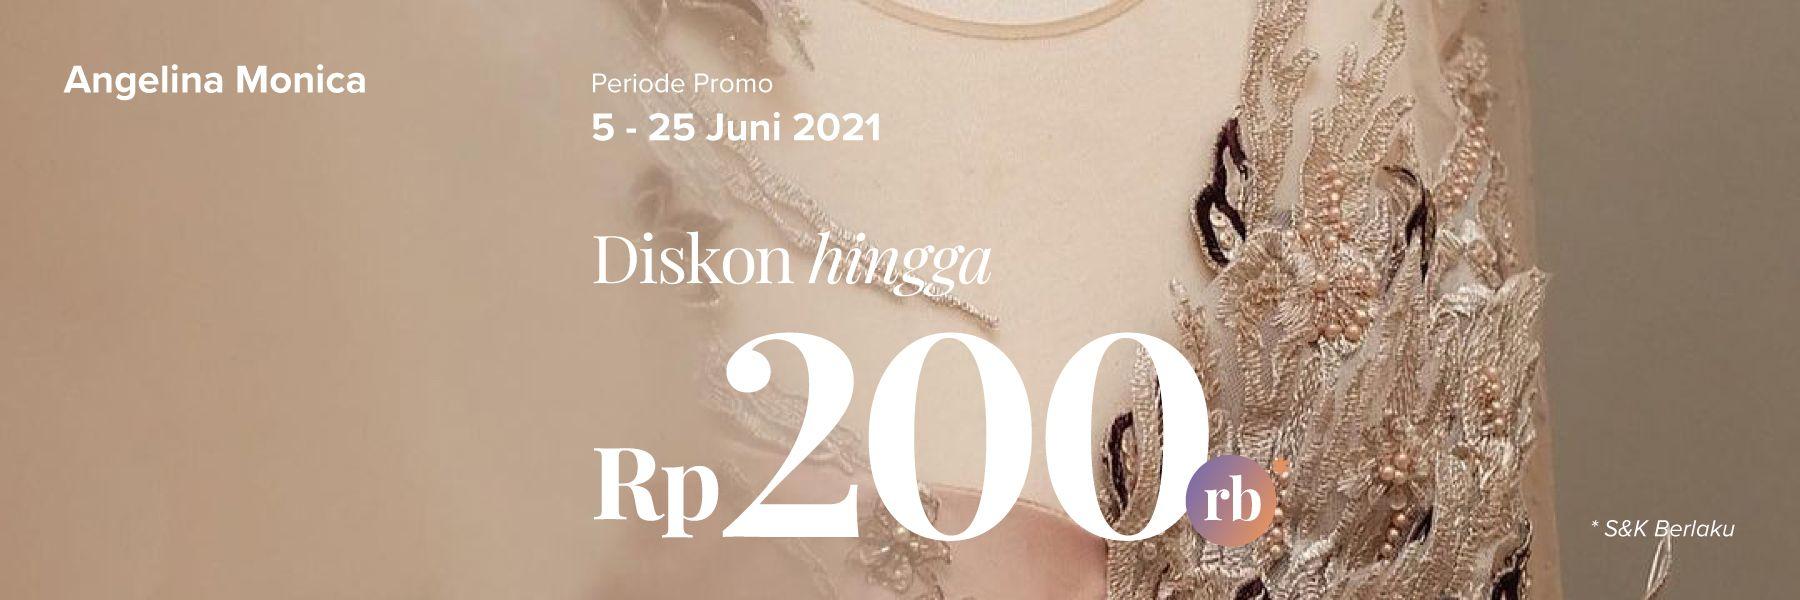 Potongan Hingga Rp 200.000 Untuk Gaun di Angelina Monica